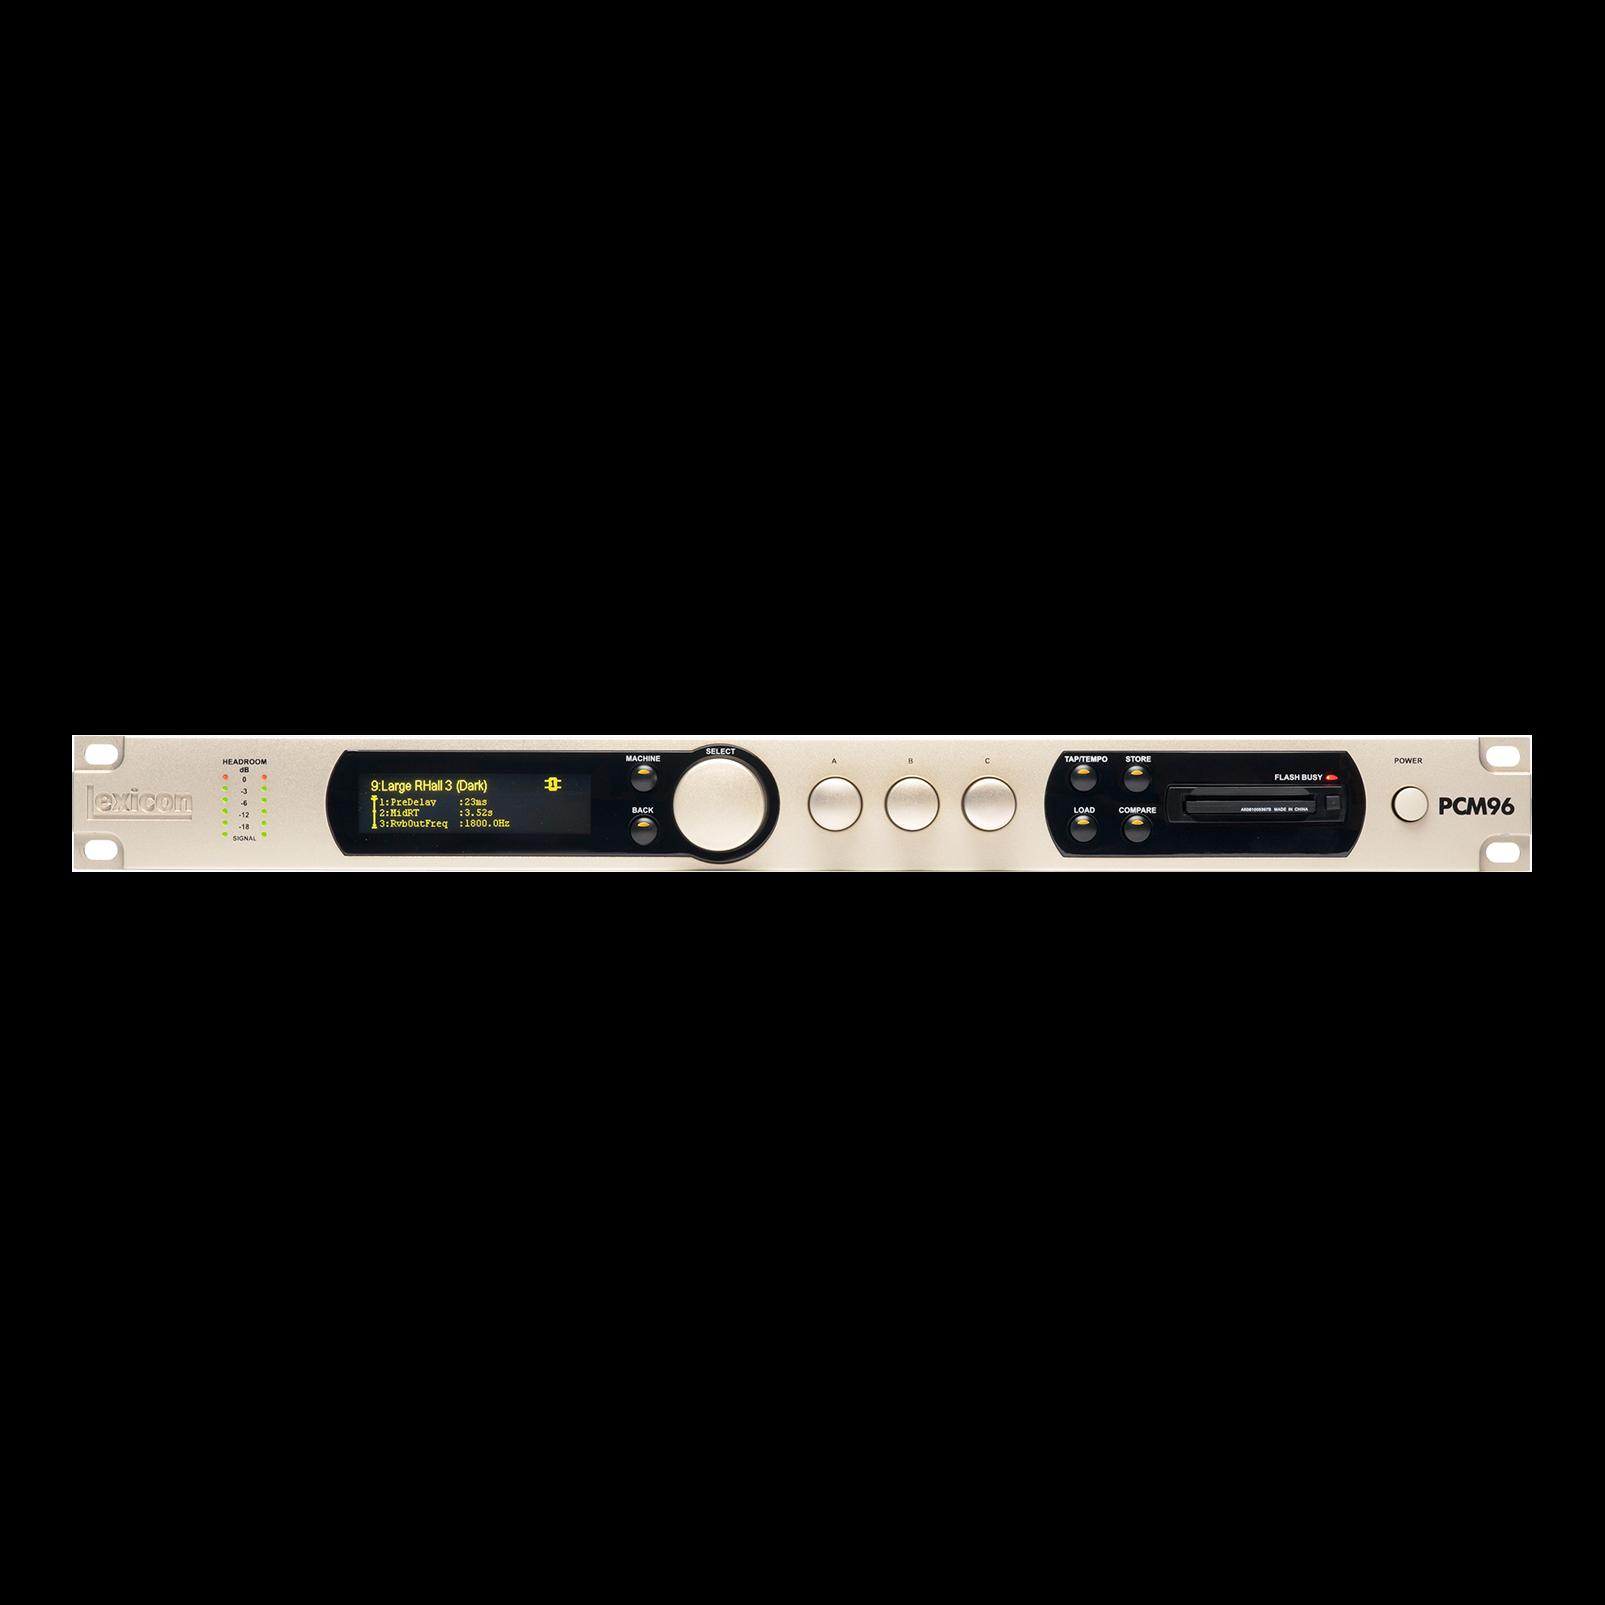 PCM96 - Nickel - Stereo Reverb/Effects Processor - Detailshot 1